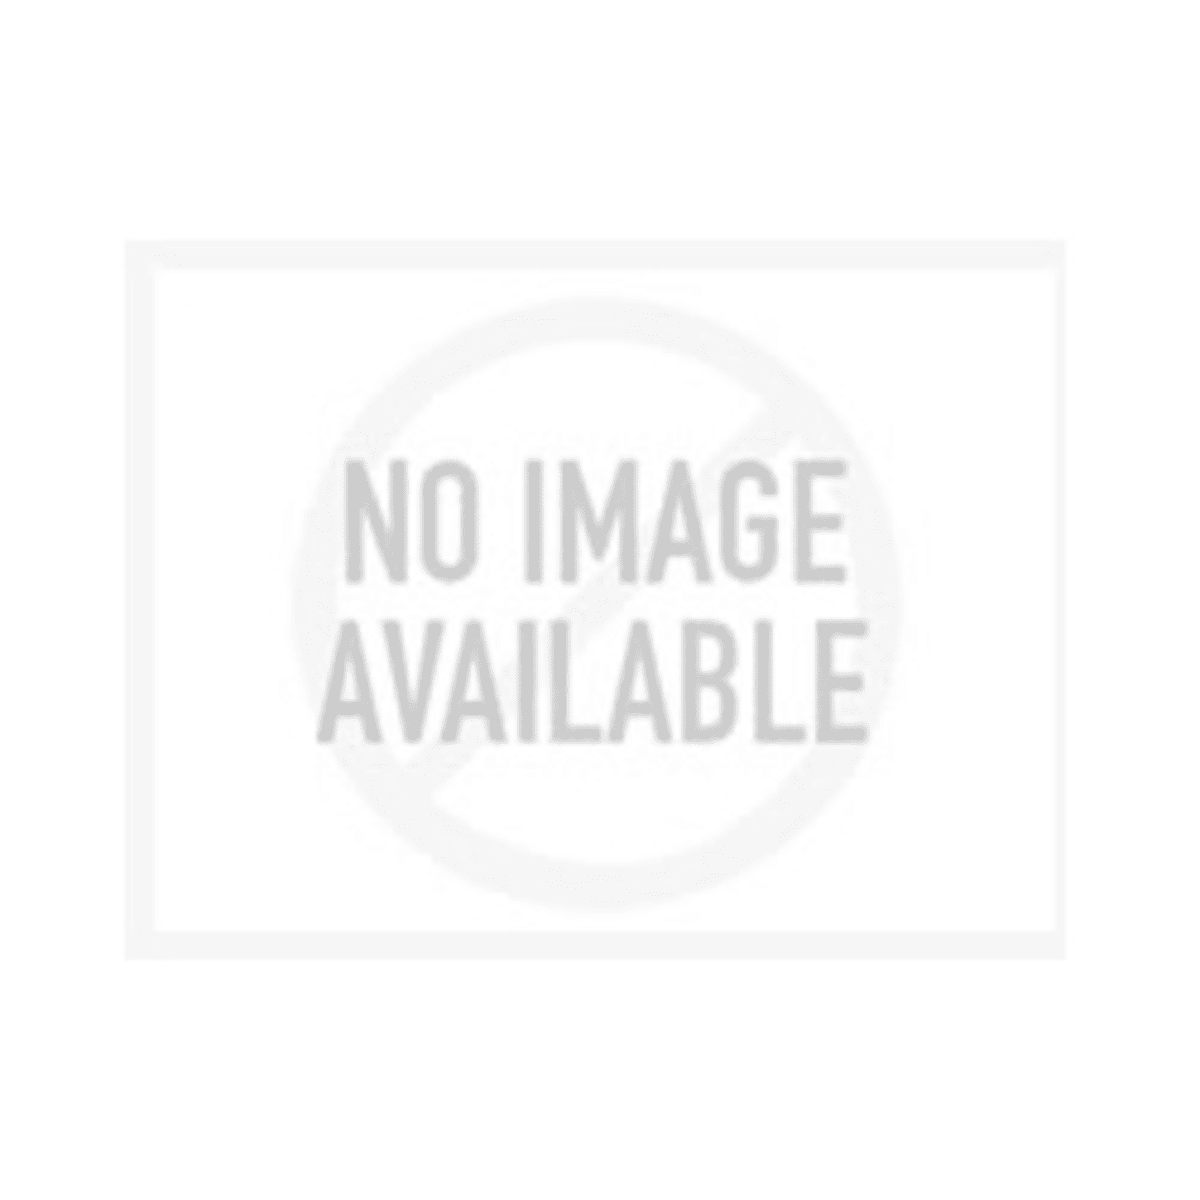 Promo Torch Tunik Women Burgundy Maroon M Terbaru 2018 Puritans Pride Vitamin B 12 2500 Mcg Sublingual 100 Microlozenges B12 Kesemutan Kebas Syaraf Vegetarian Sportsmans Warehouse Otg Womens Tropical Mist Support Crop Top